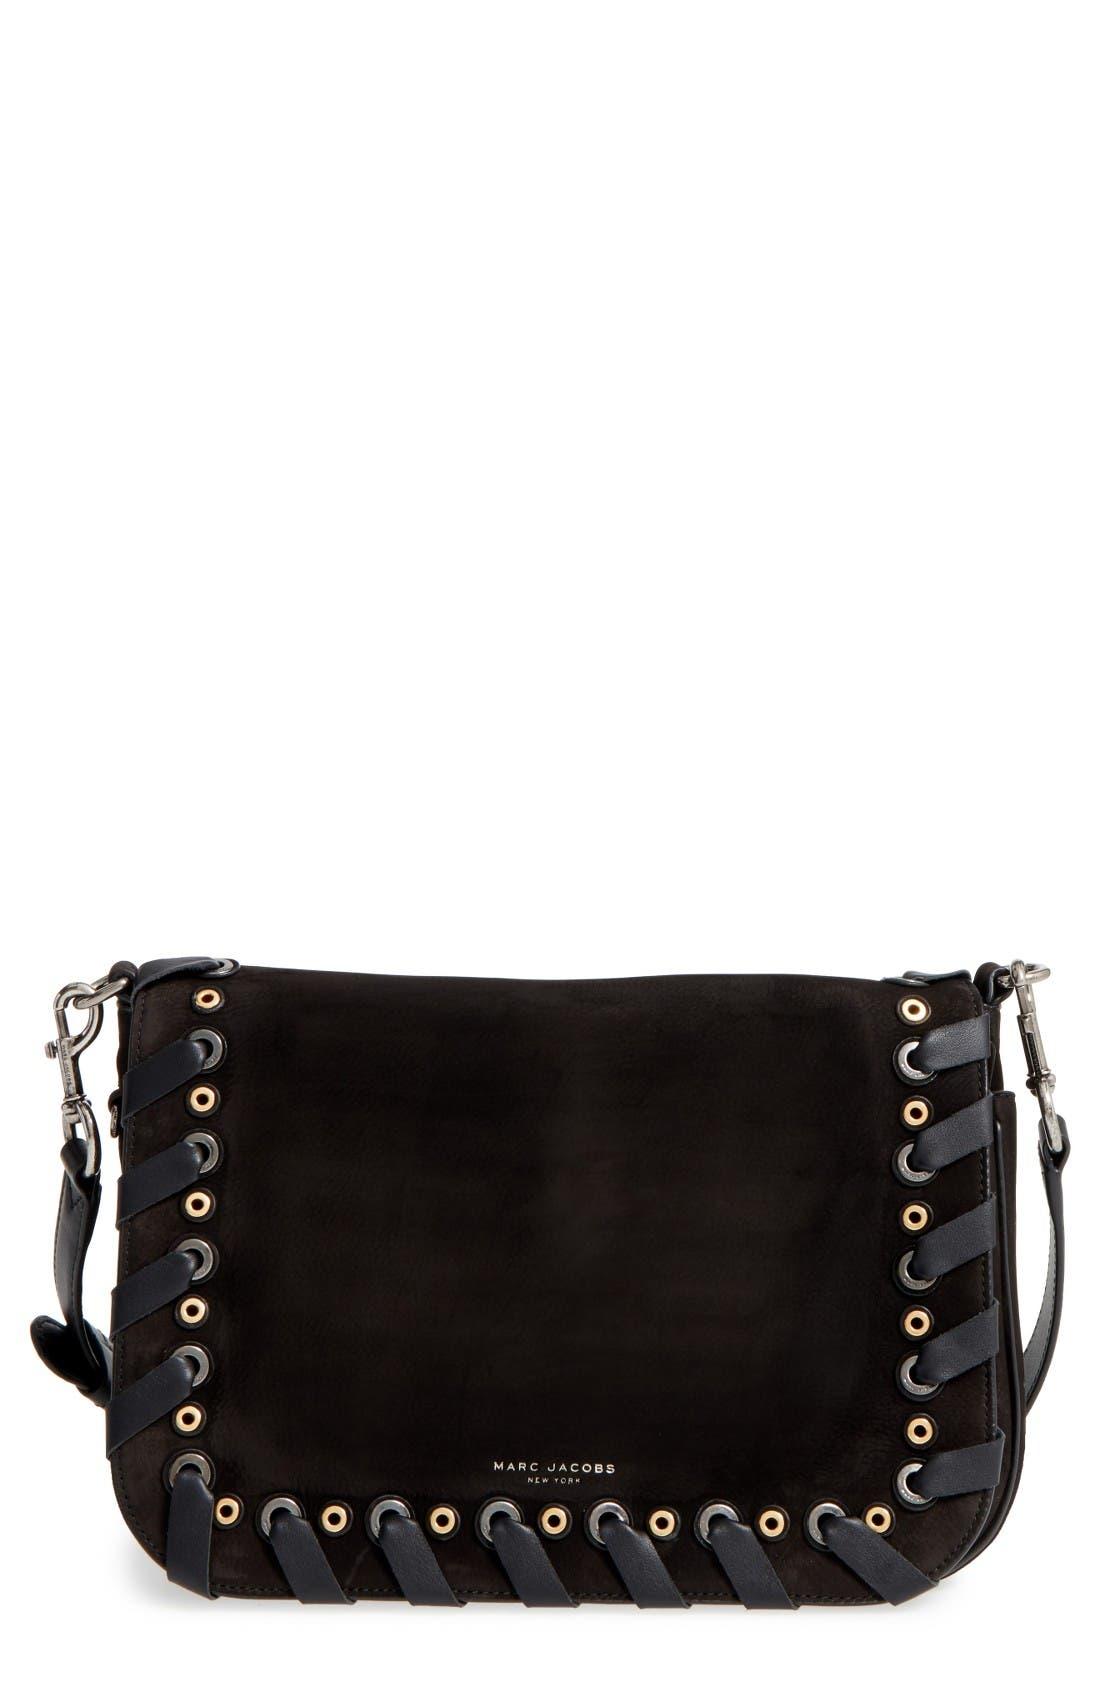 Main Image - MARC JACOBS Courier Nubuck Leather Shoulder Bag